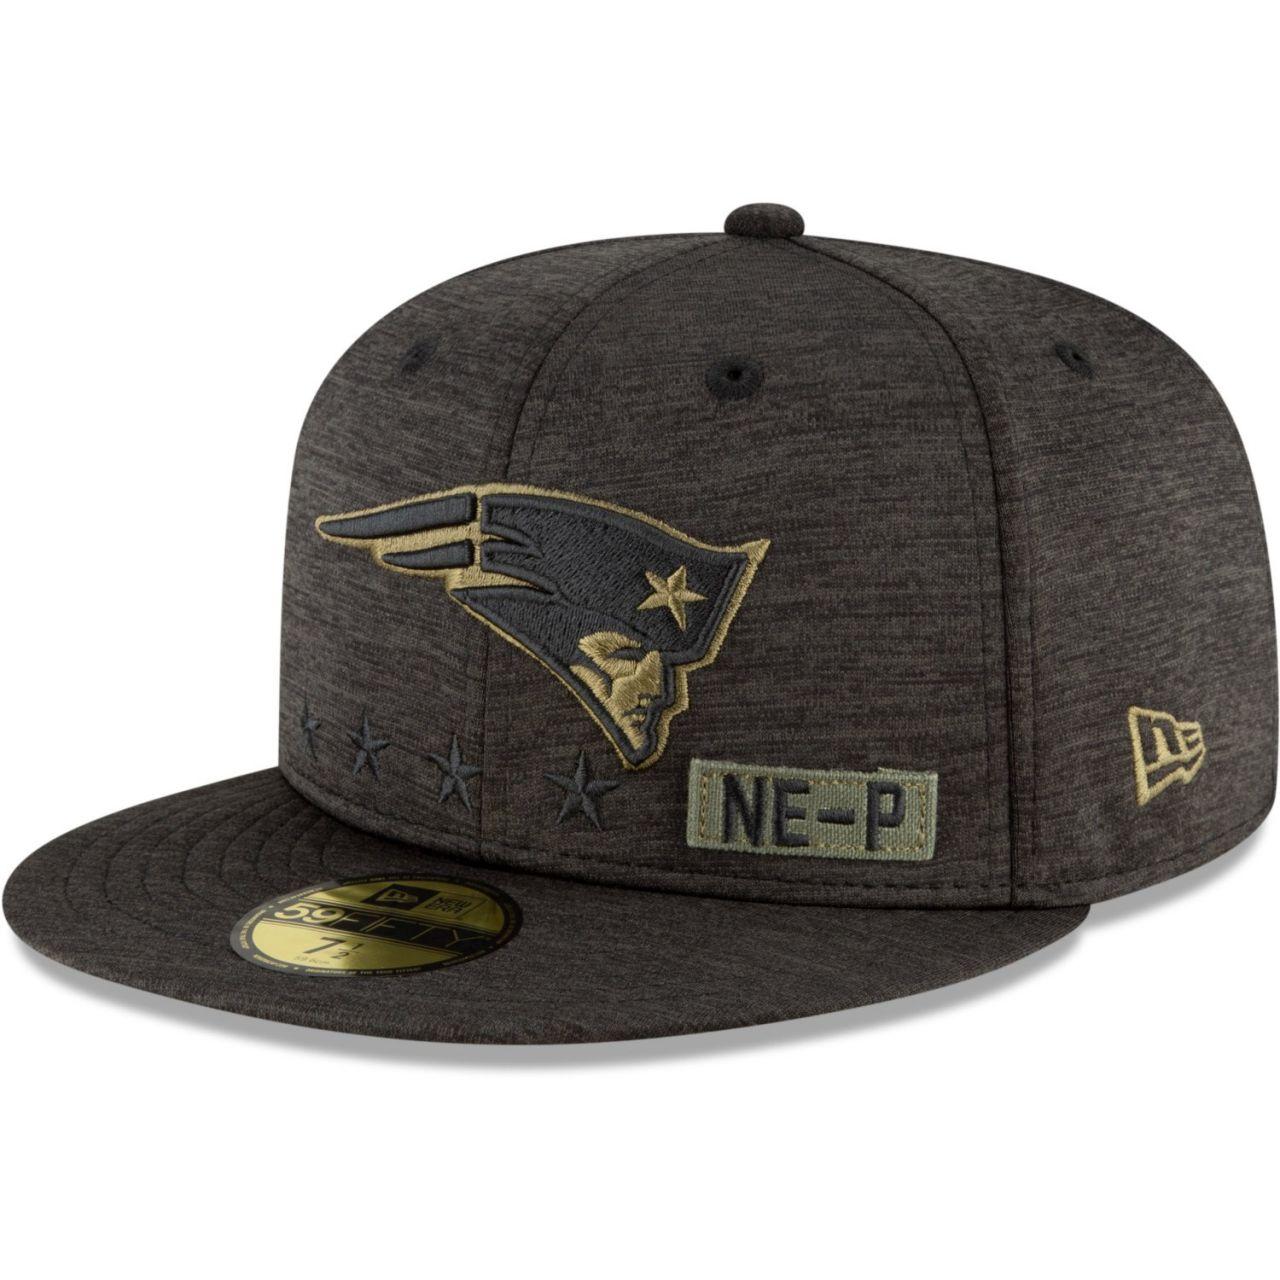 amfoo - New Era 59FIFTY Cap Salute to Service New England Patriots